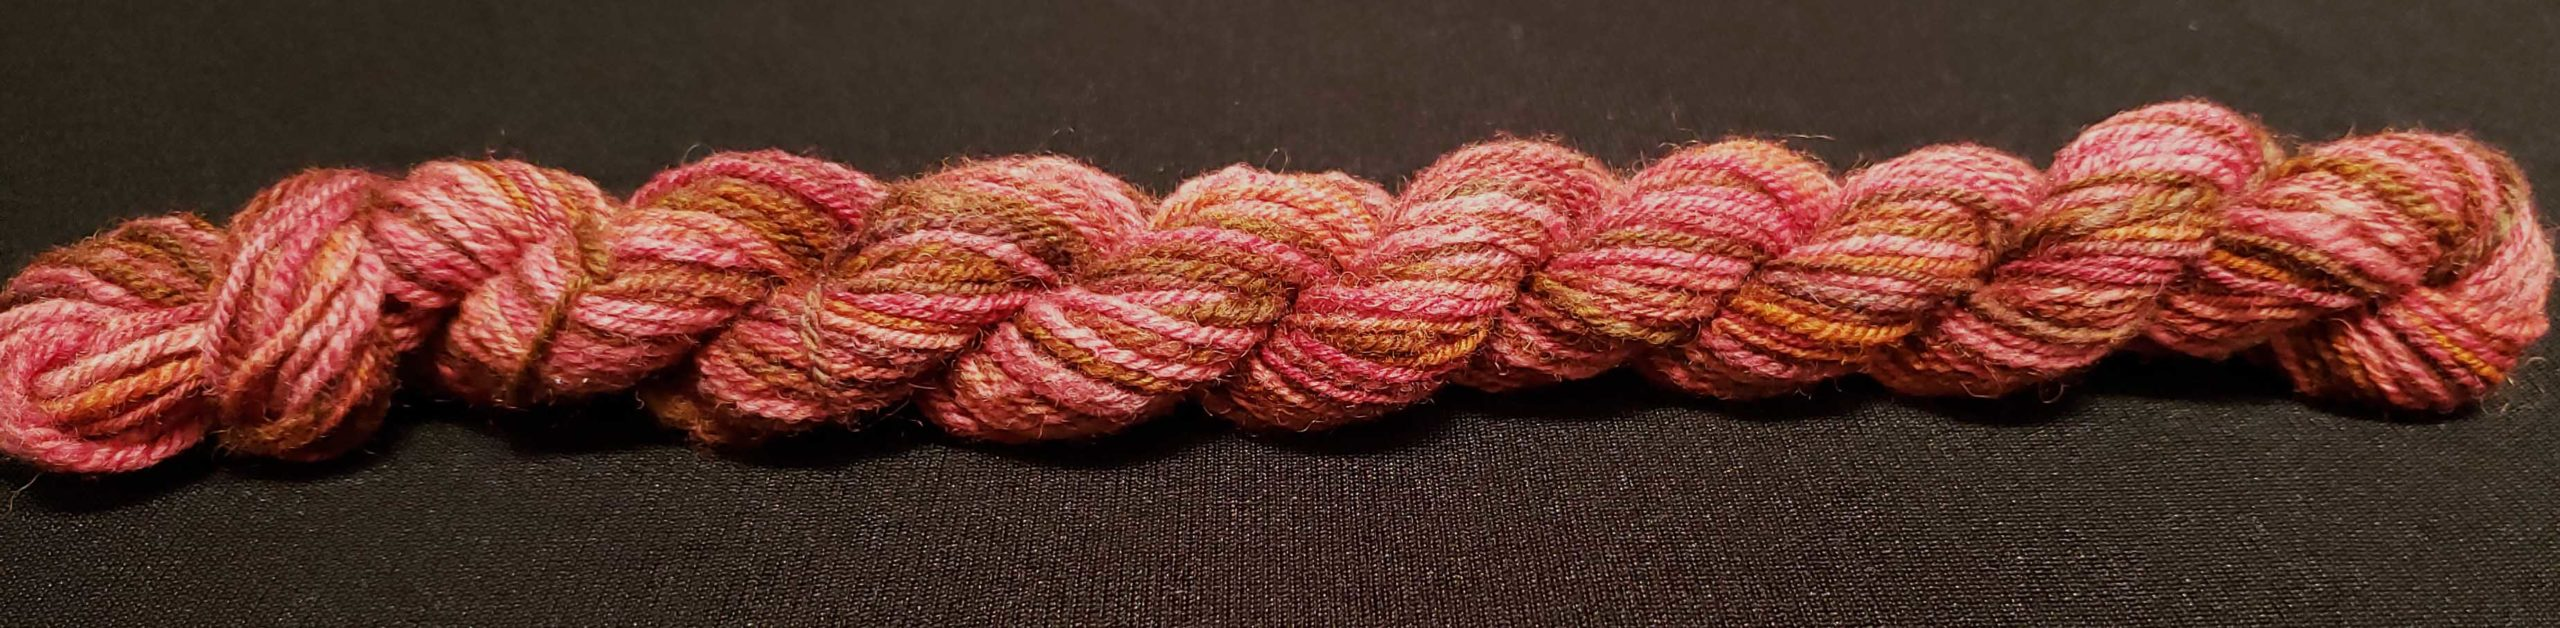 Woolen Handspun Skein 3 ply